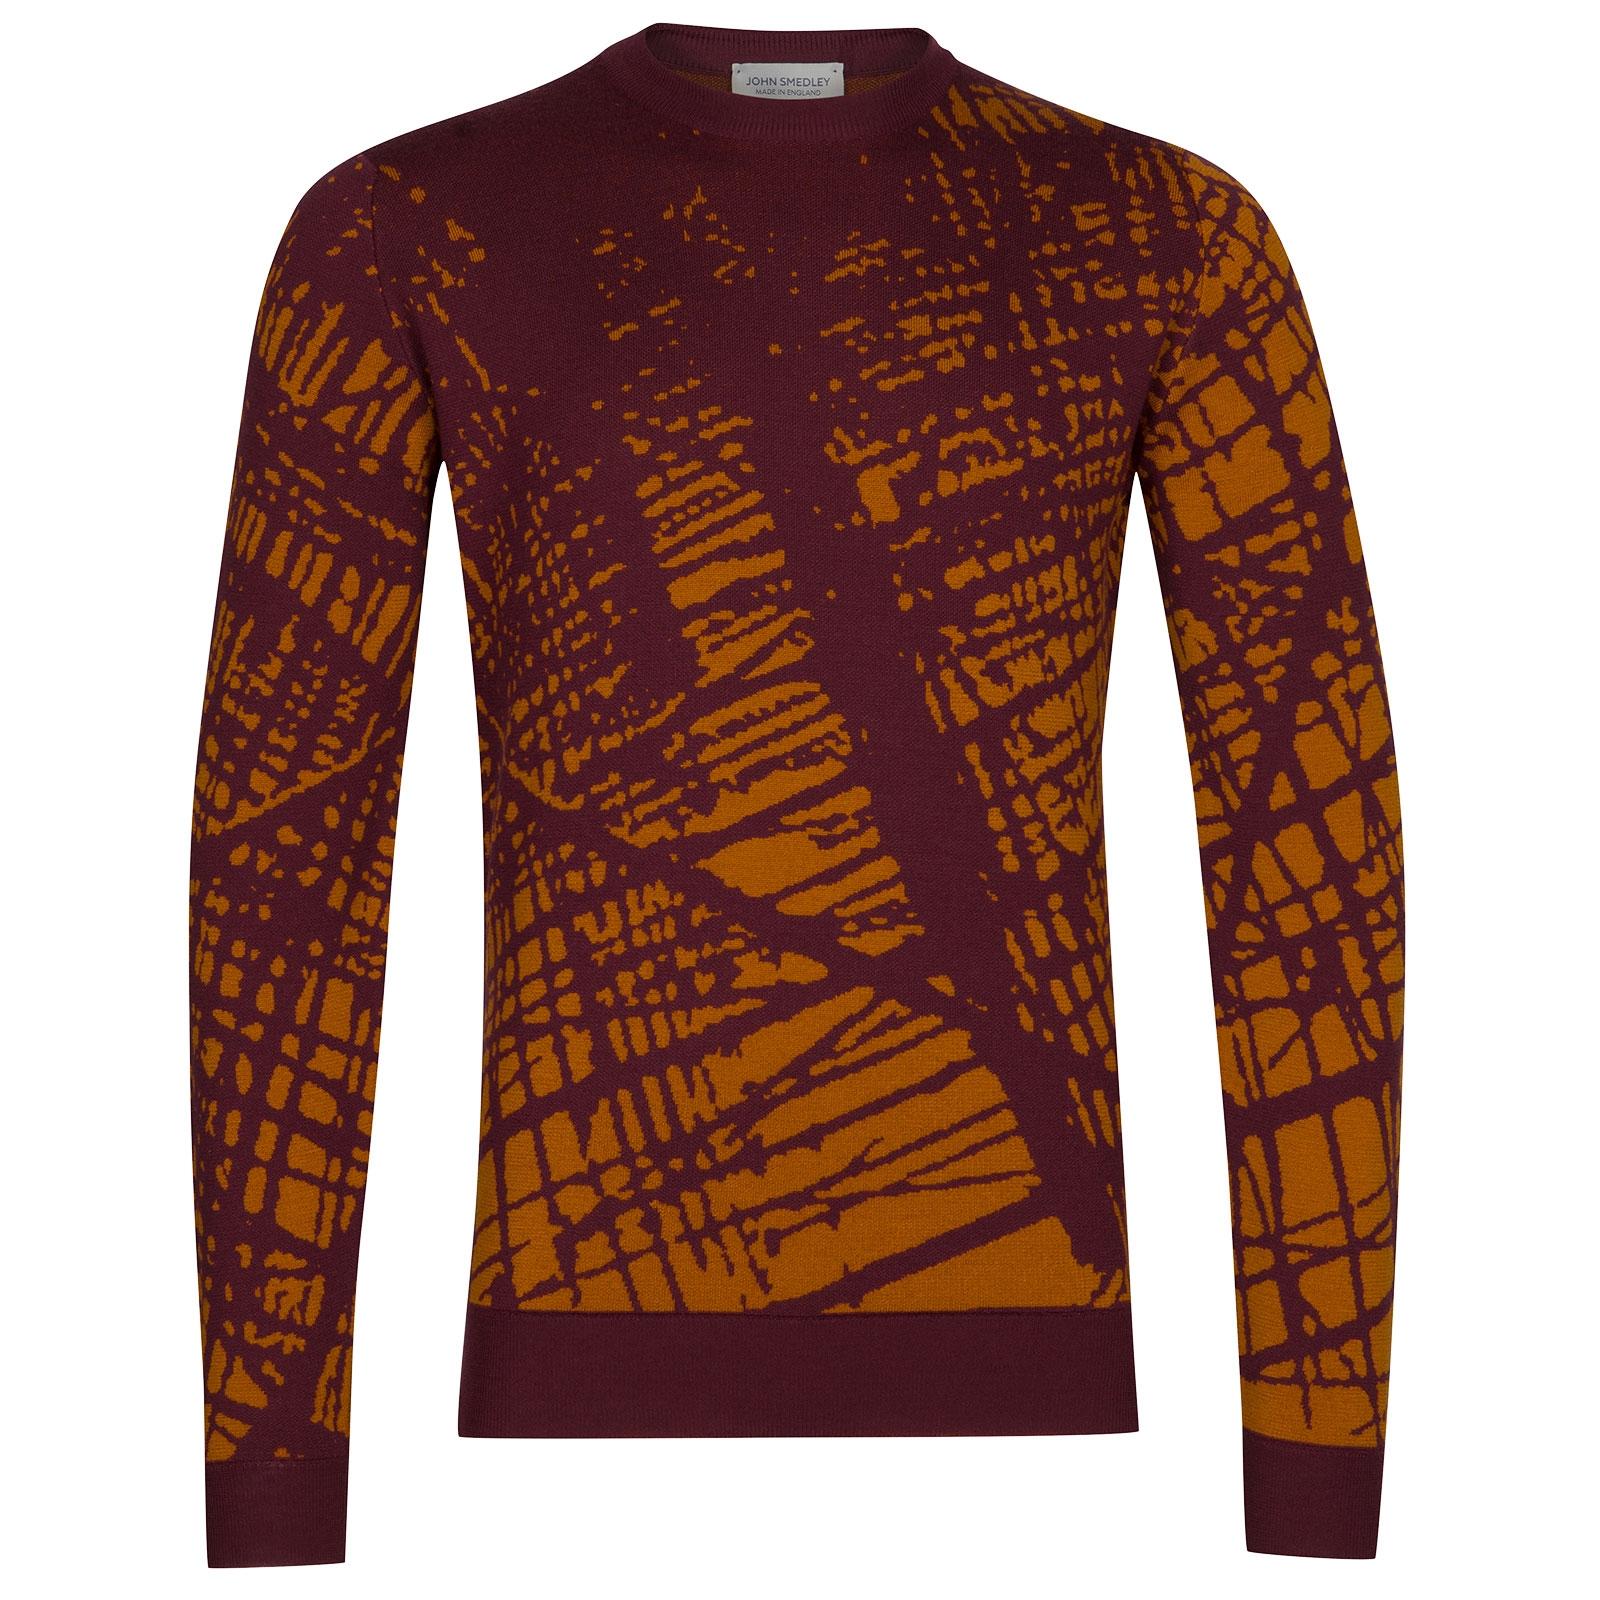 John Smedley Sagan Extra Fine Merino Wool Pullover in Bordeaux-M